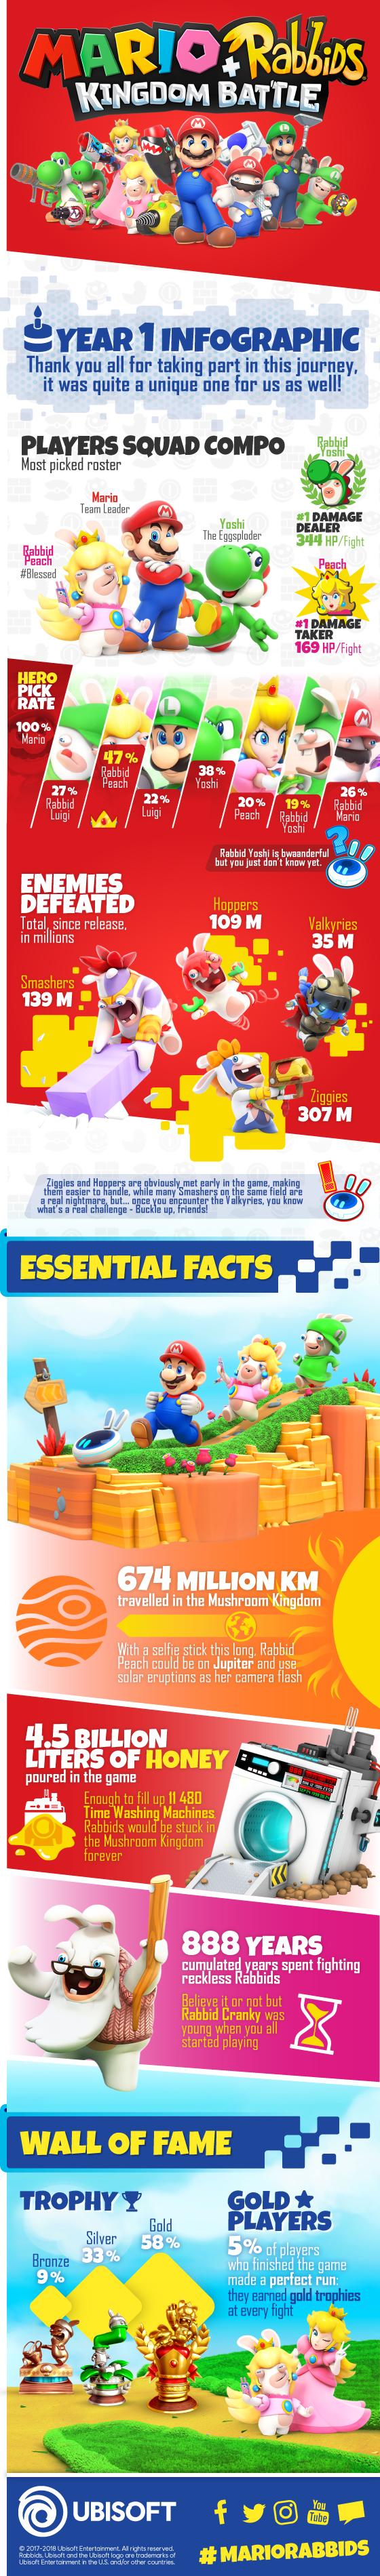 Mario + Rabbids: Kingdom Battle Infographic